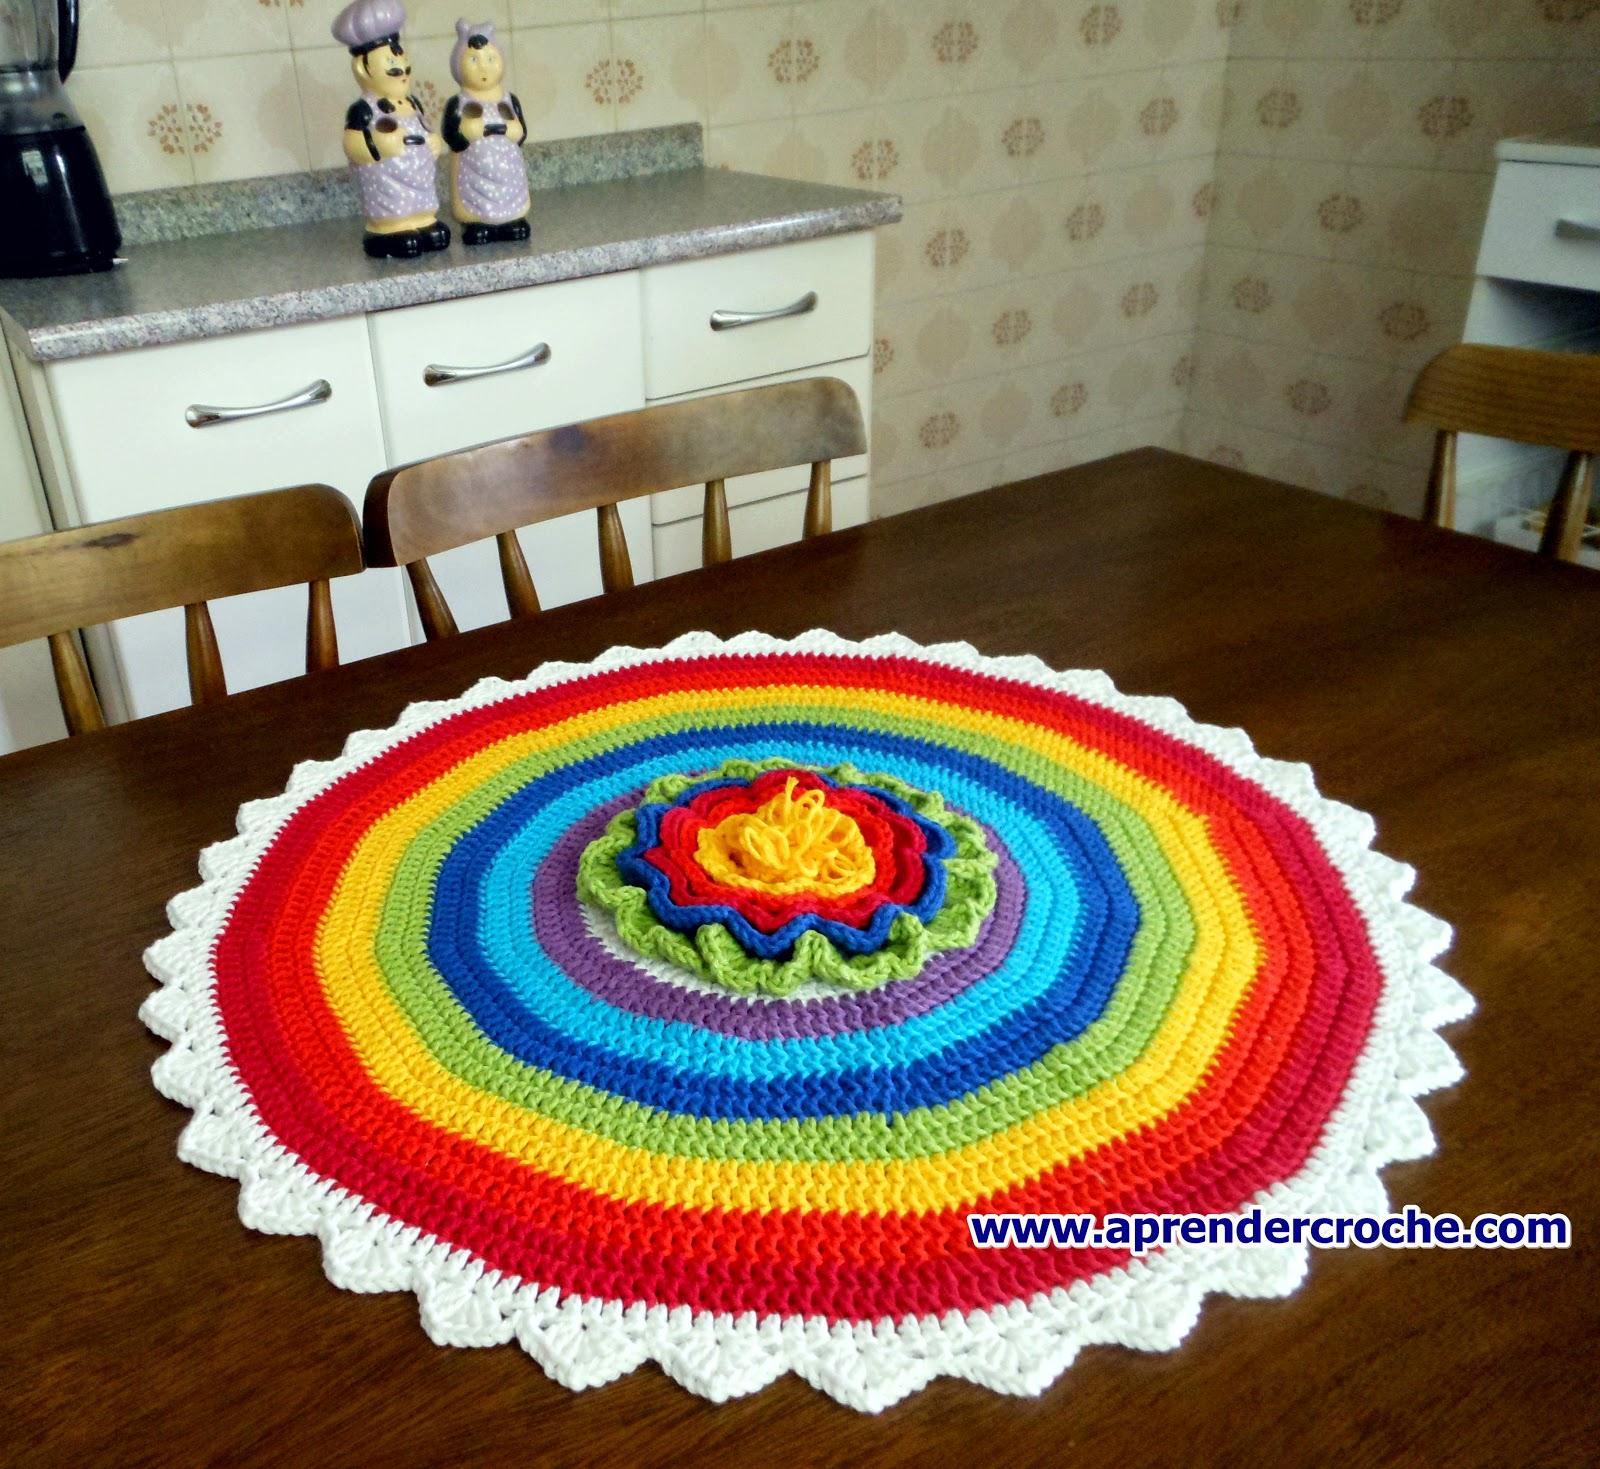 aprender croche gratis com centro de mesa arco-iris dvd video aulas loja curso de croche frete gratis